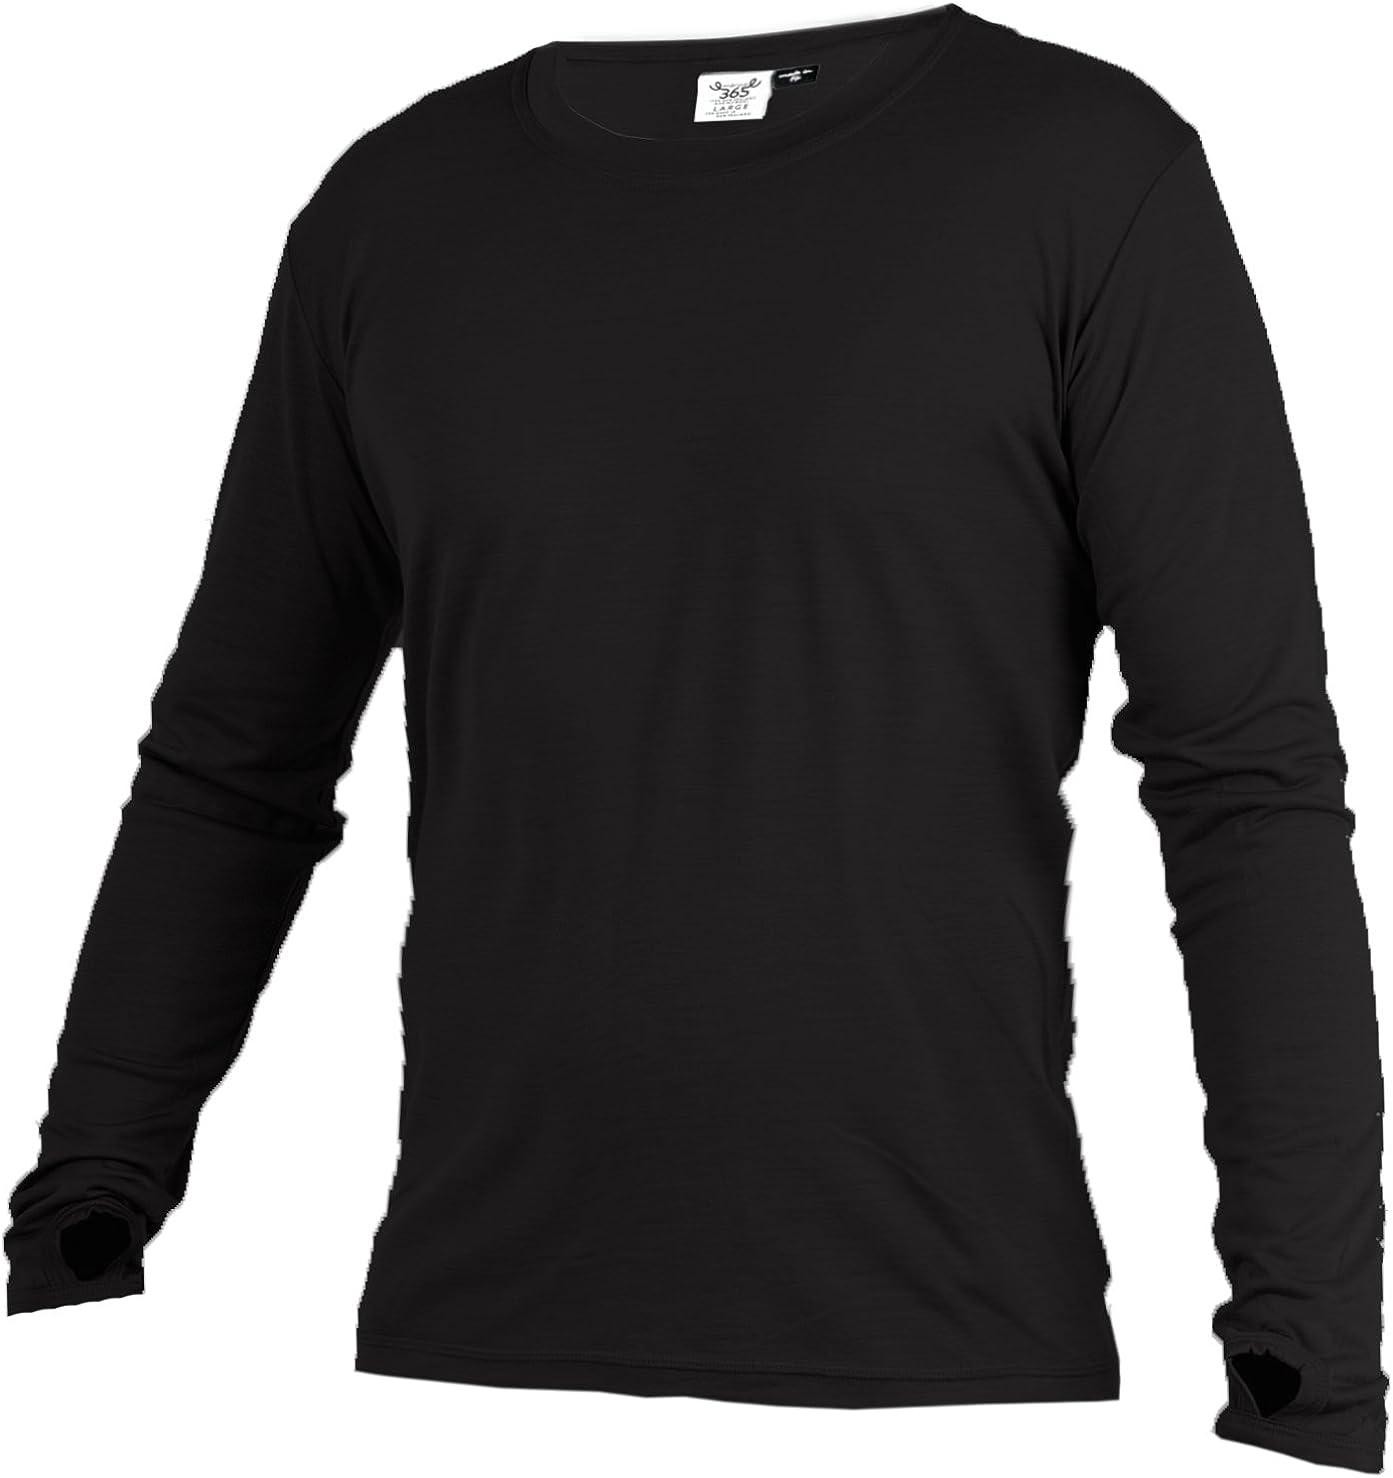 Merino 365 OG Light 100% New Zealand Merino Longsleeve Baselayer Thermal Shirt with Thumbloops